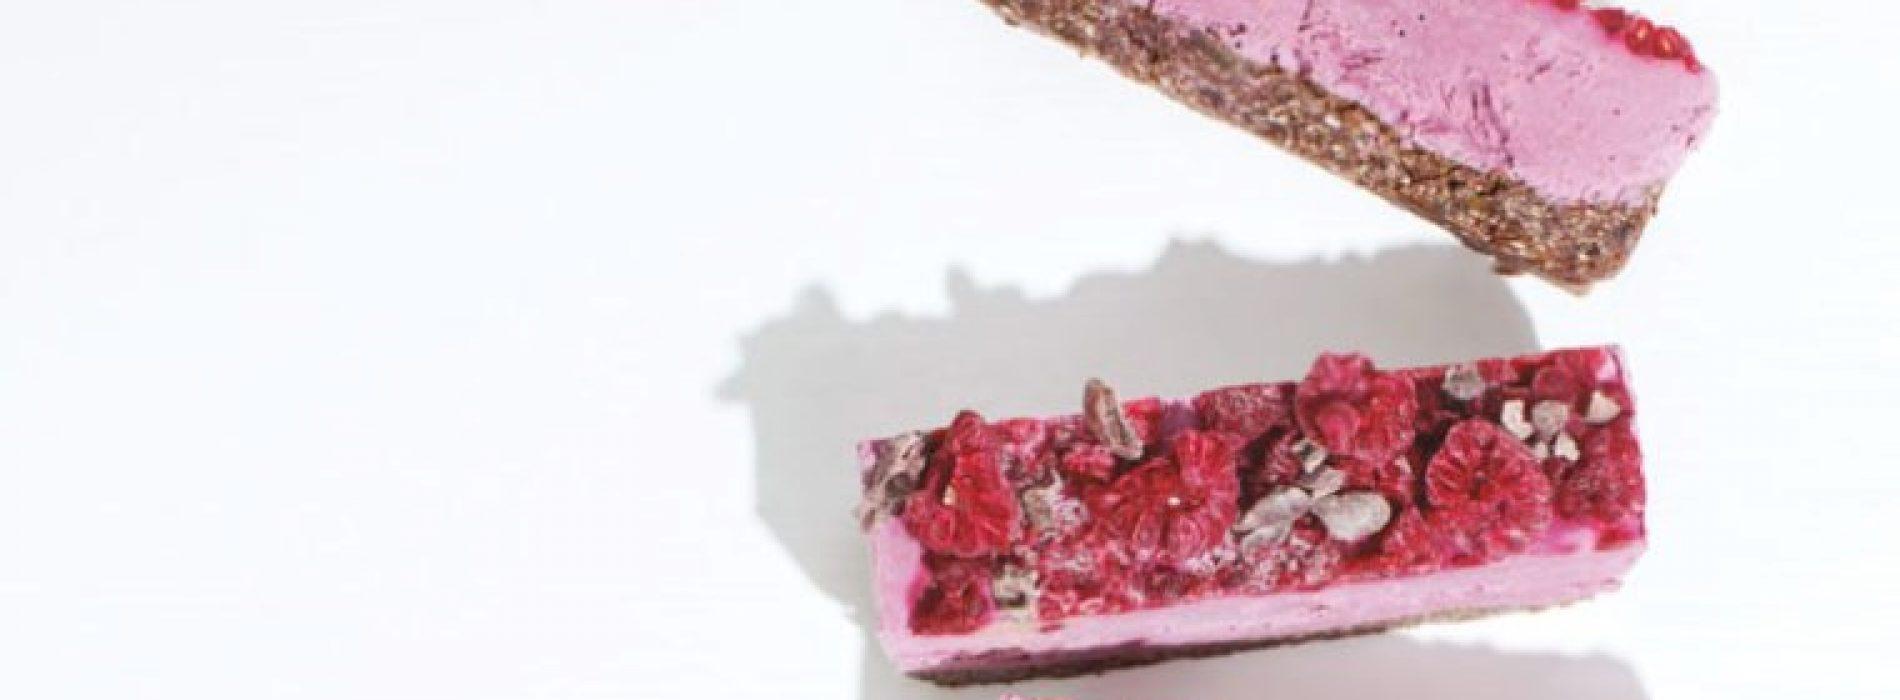 Gezonde desserts: Frambozen cacao plakken